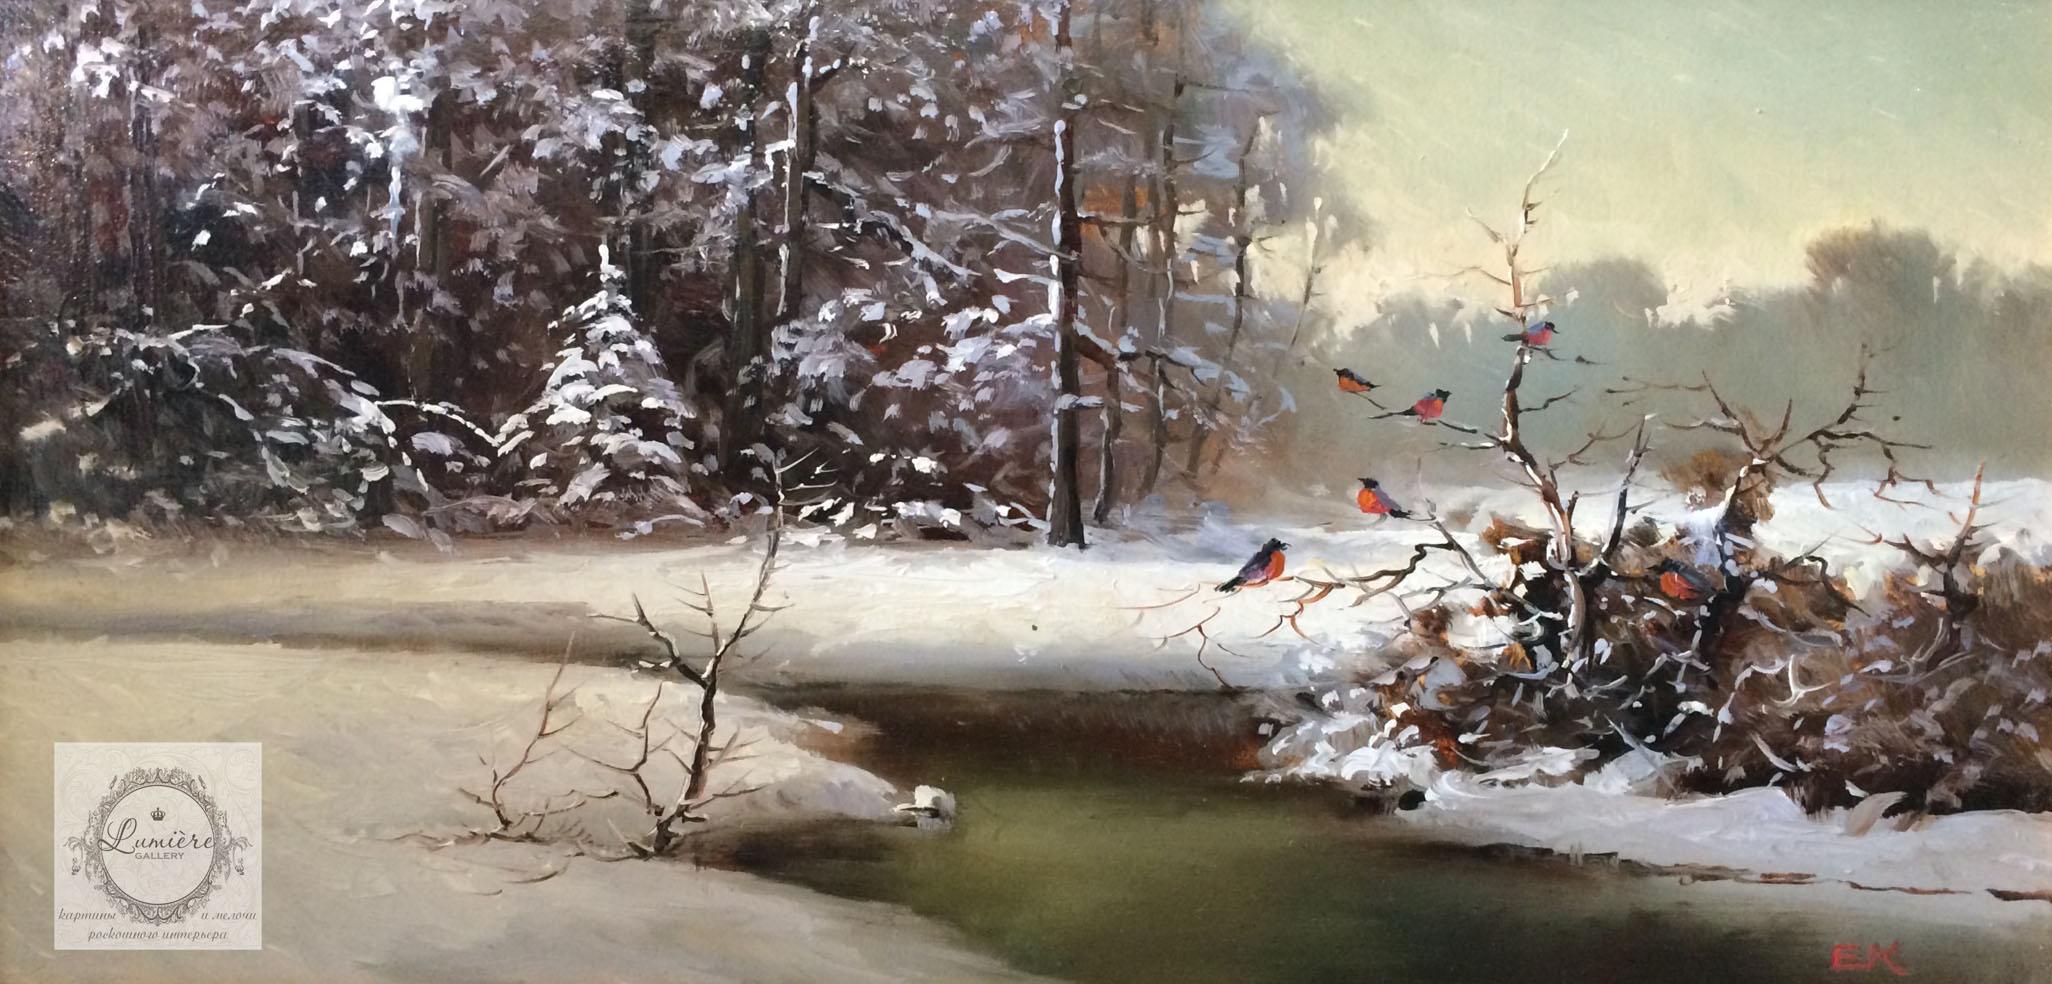 Евгений Каковкин - снегири зимой 40х20 2014.jpg